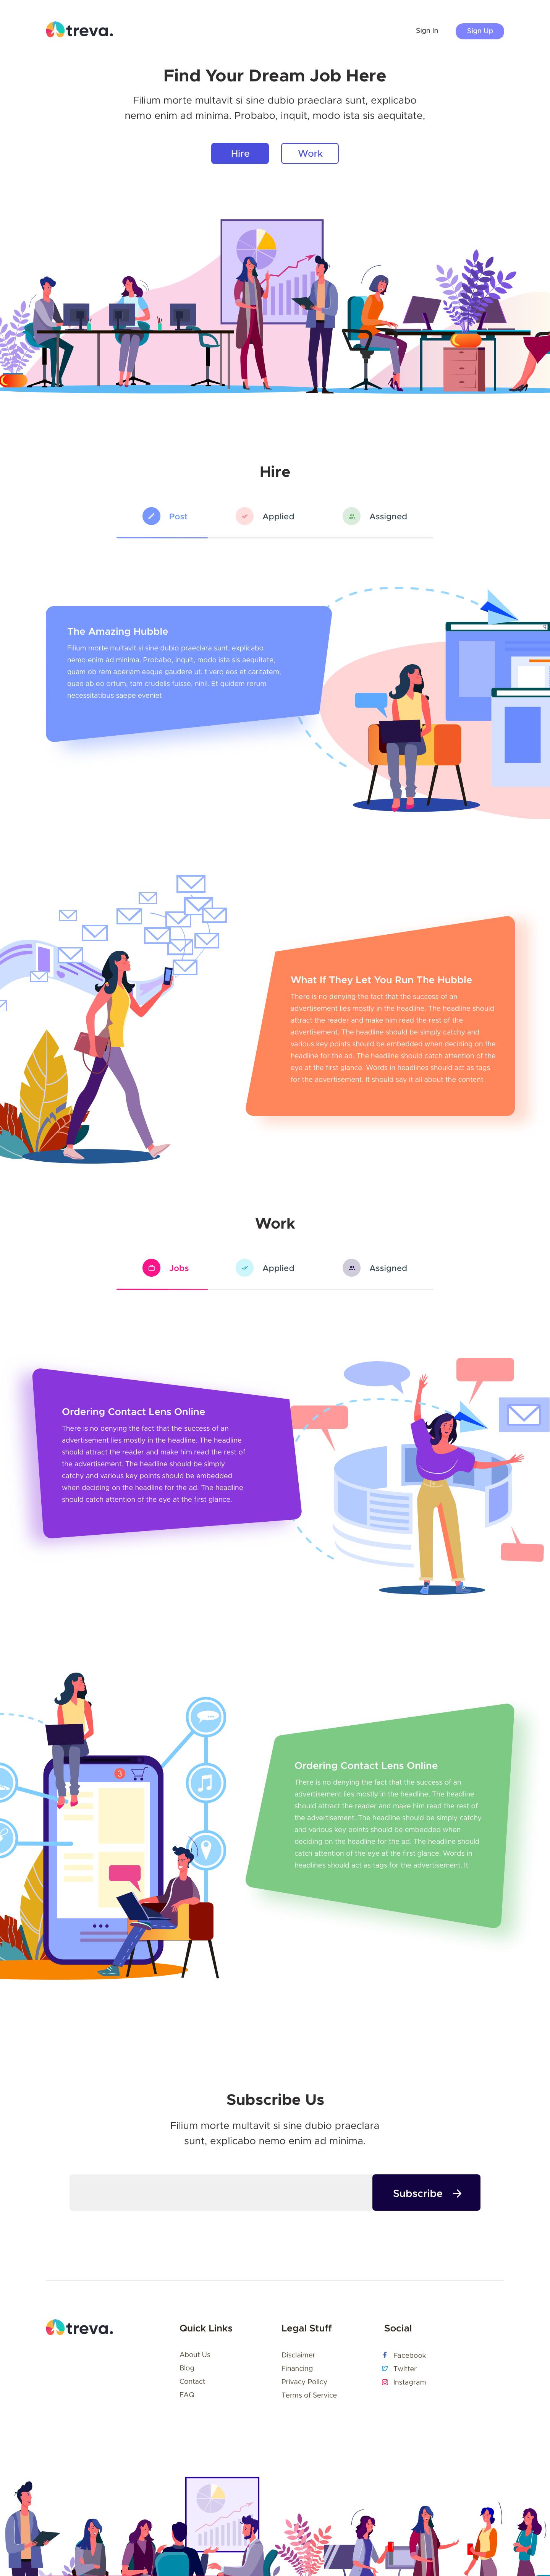 Treva - Job Hiring Landing Page for Sketch - Elegant and clean landing page design for job hiring platform.